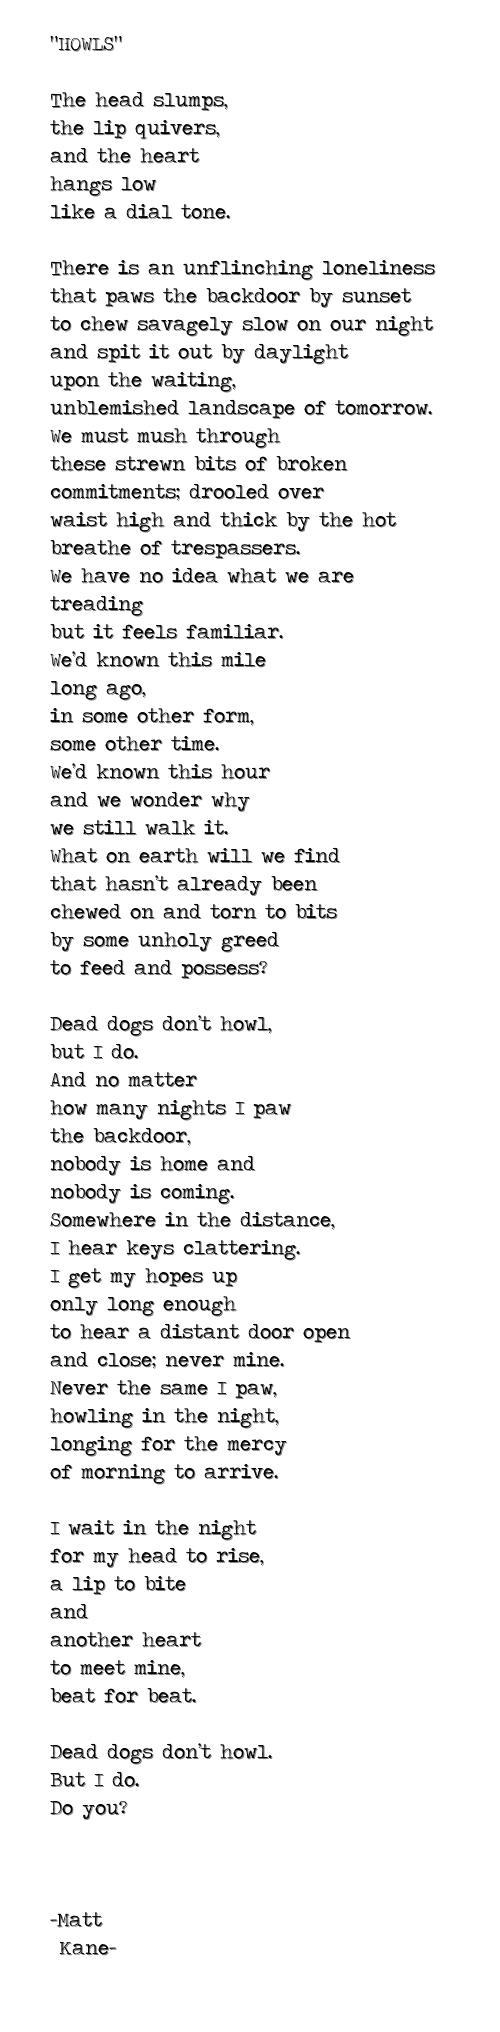 HOWLS - a poem by Matt Kane